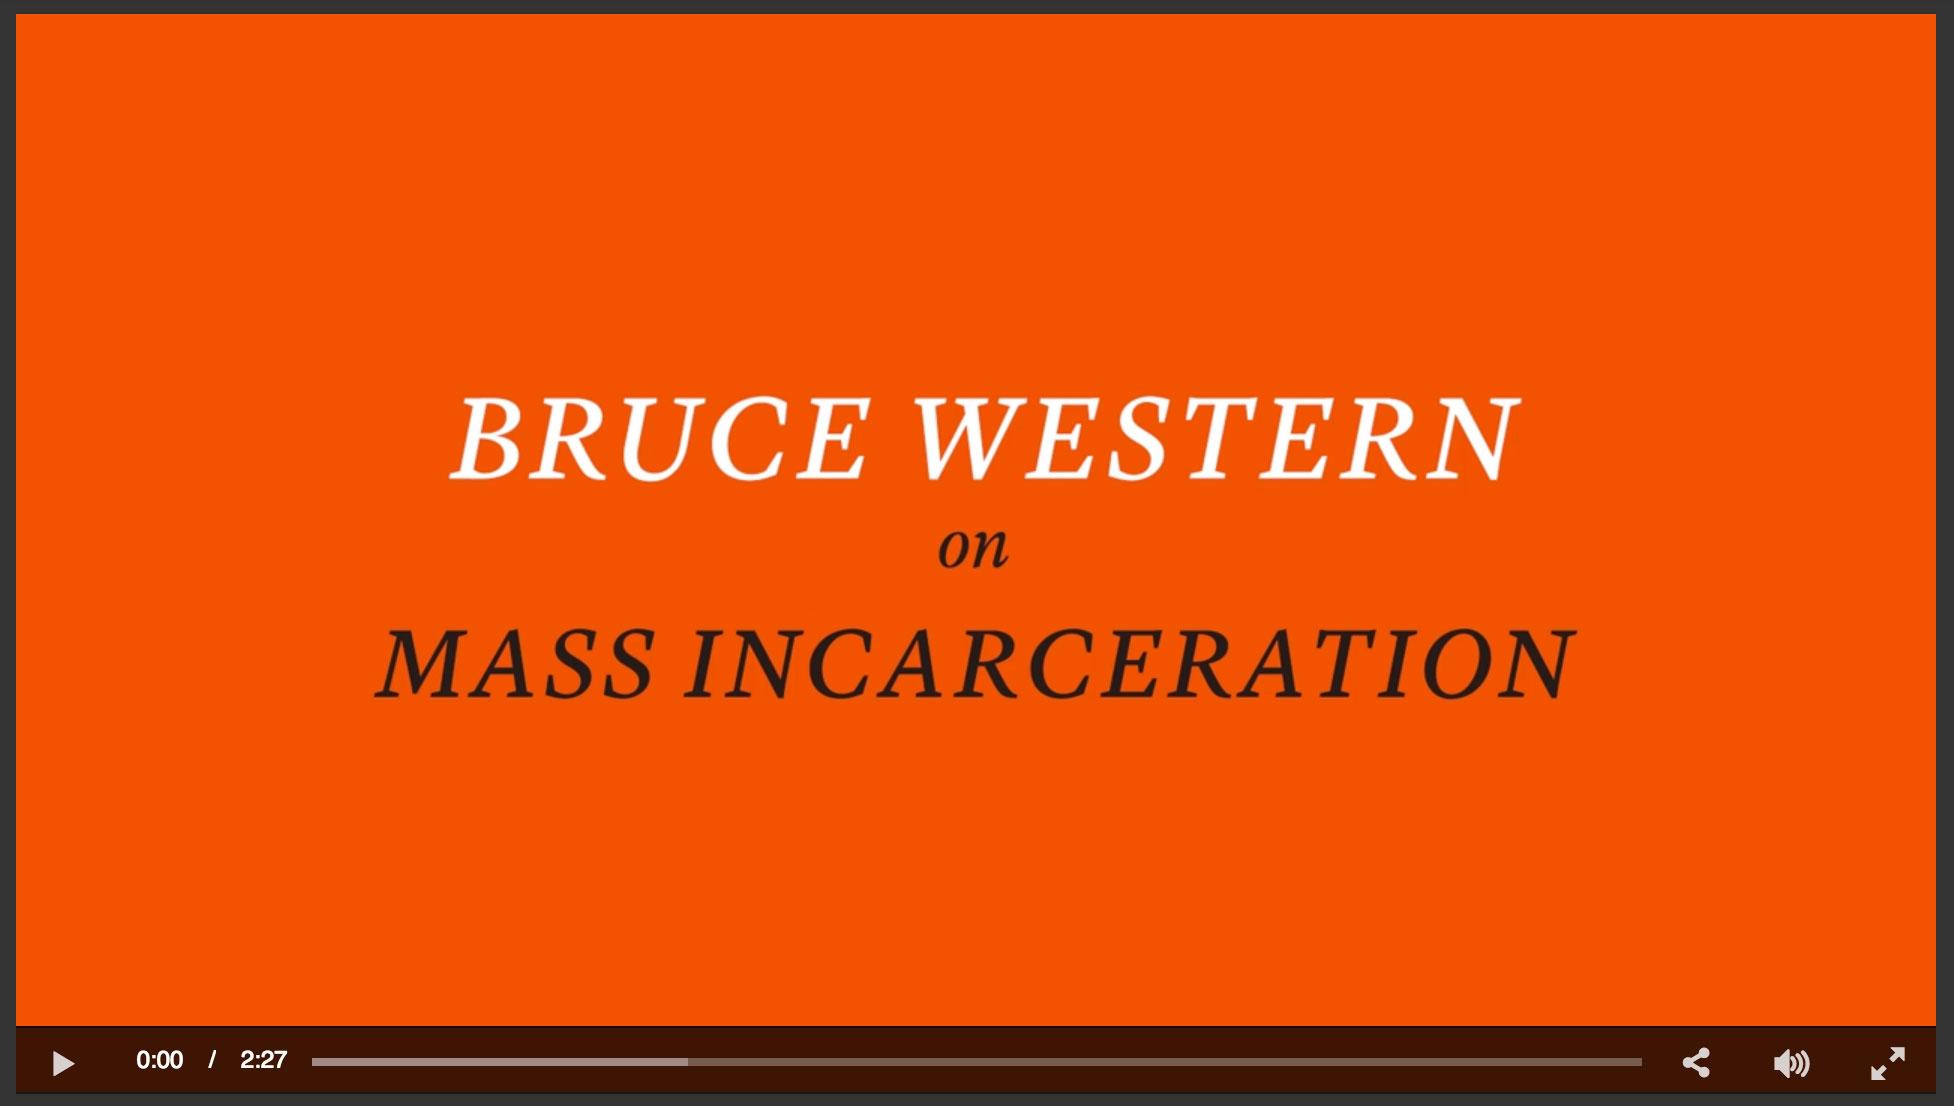 Video on Mass Incarceration